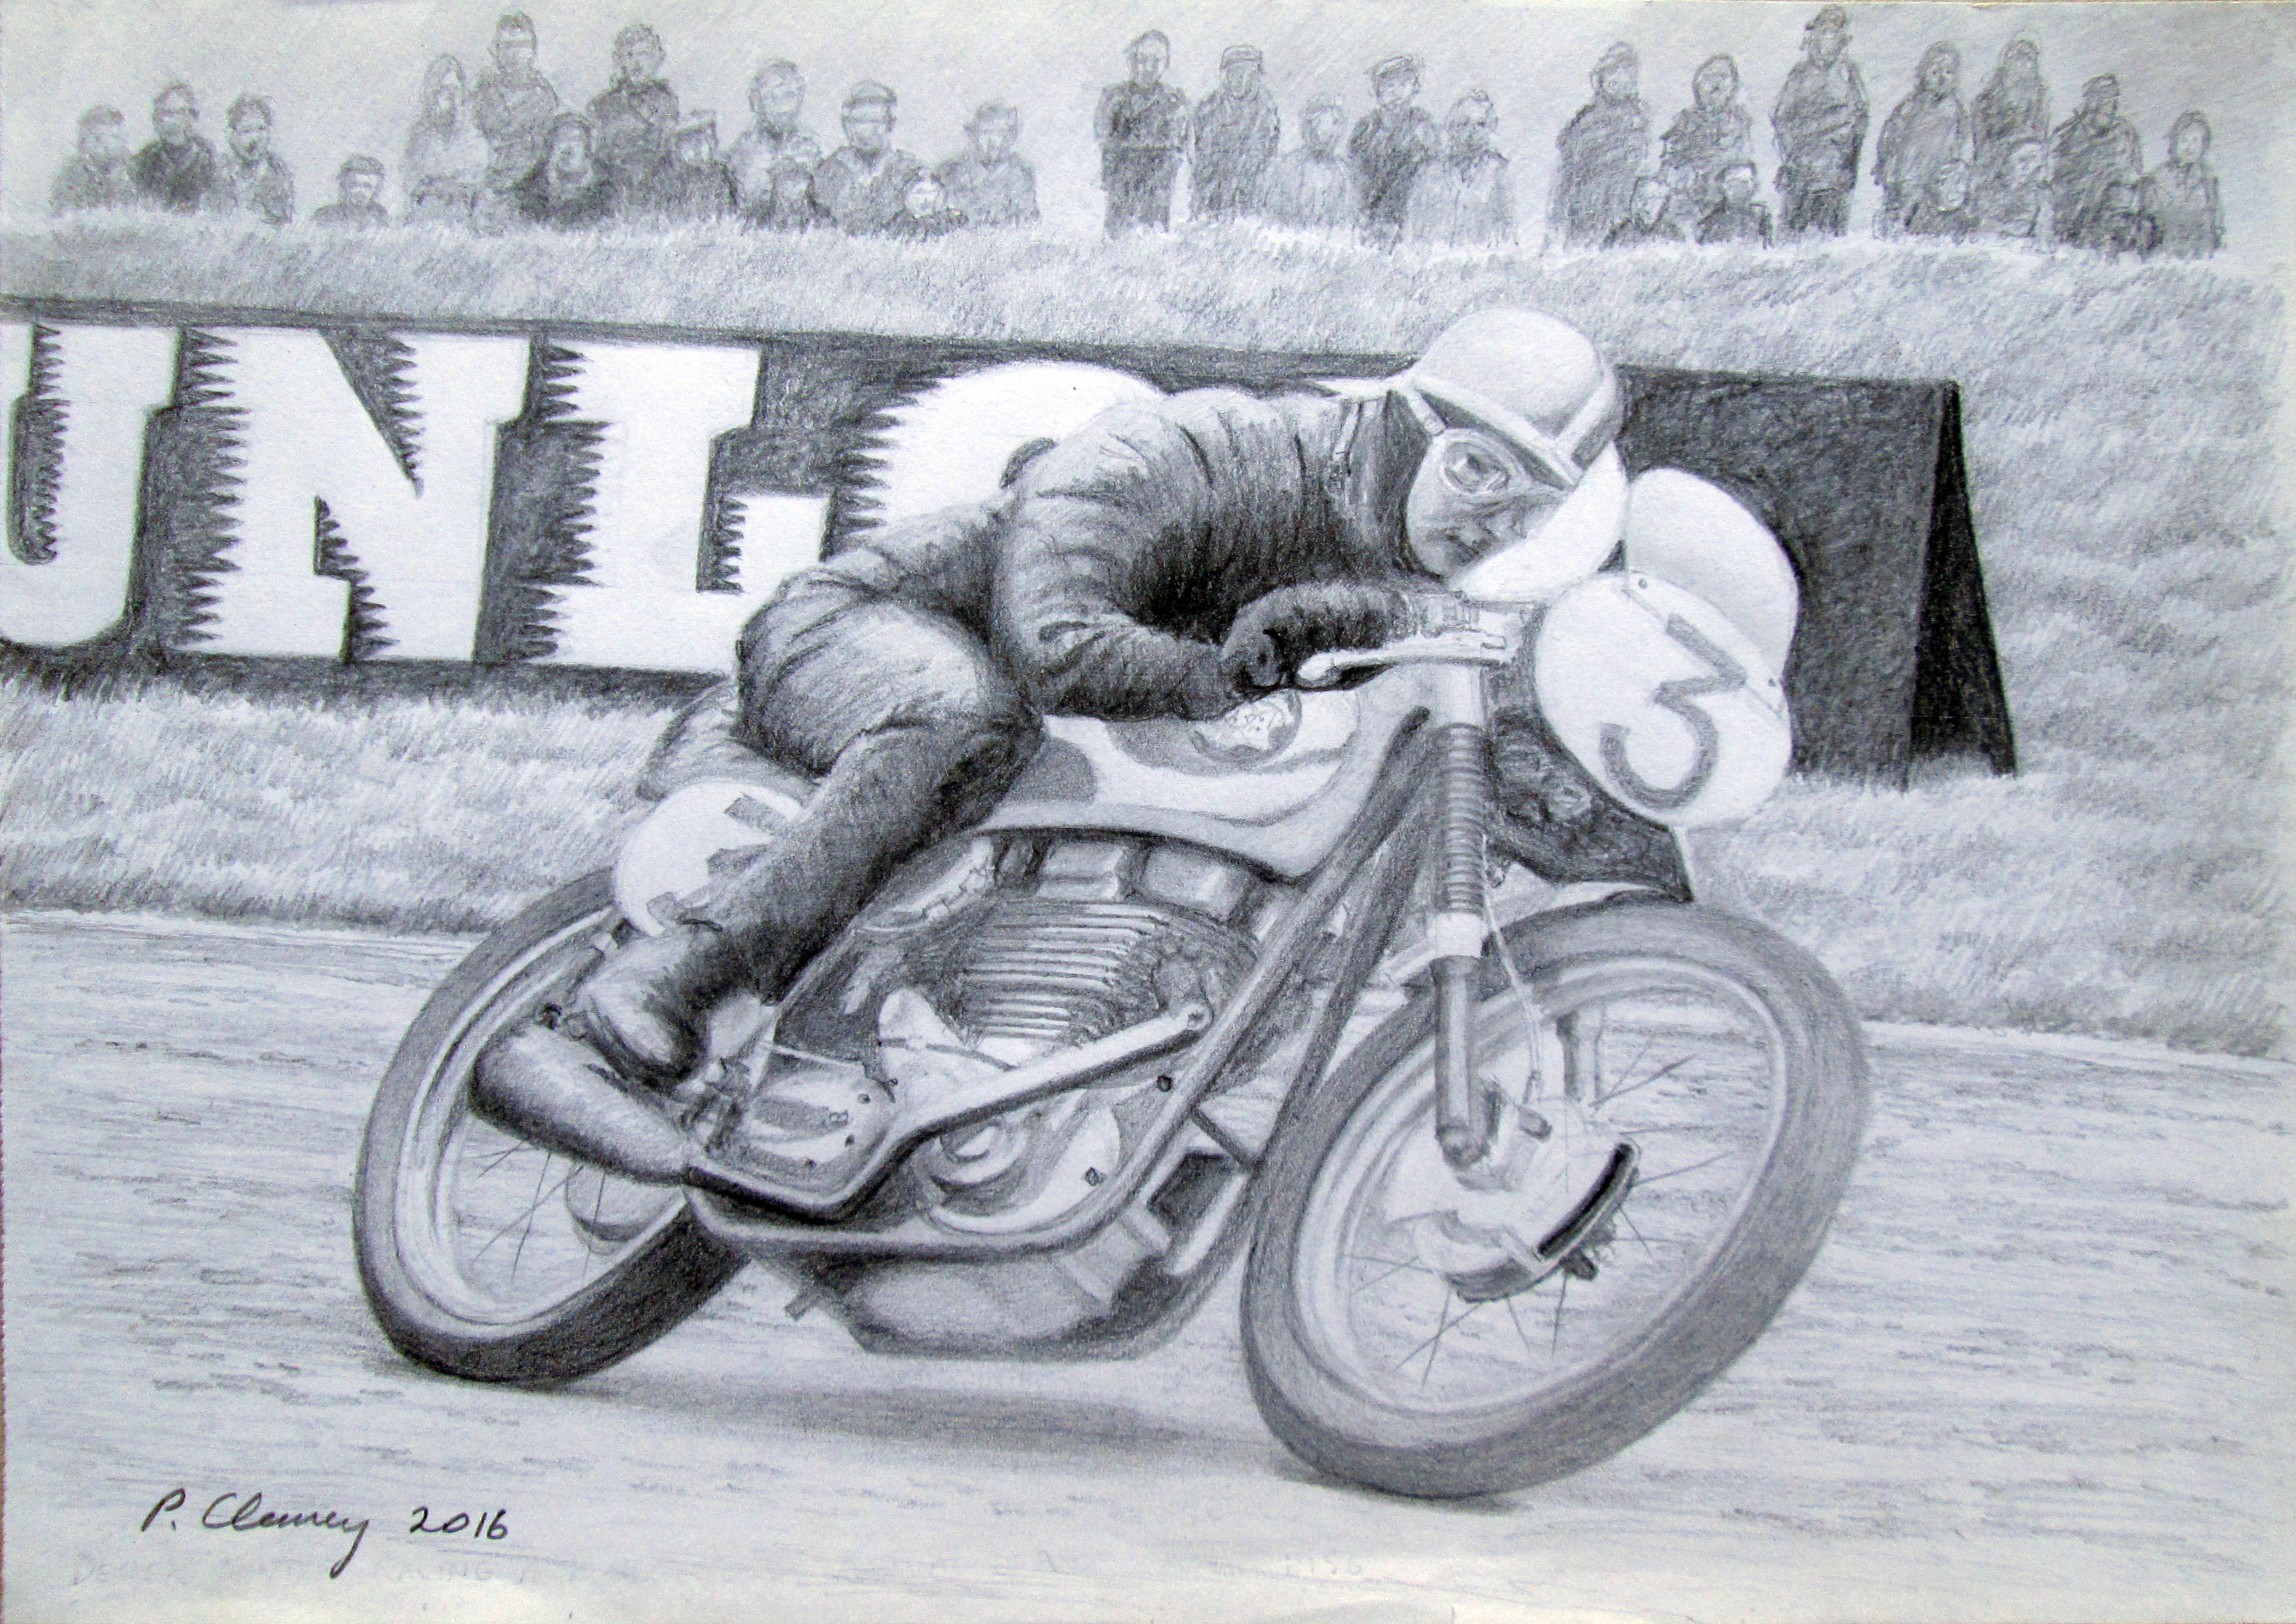 Pat Clancy